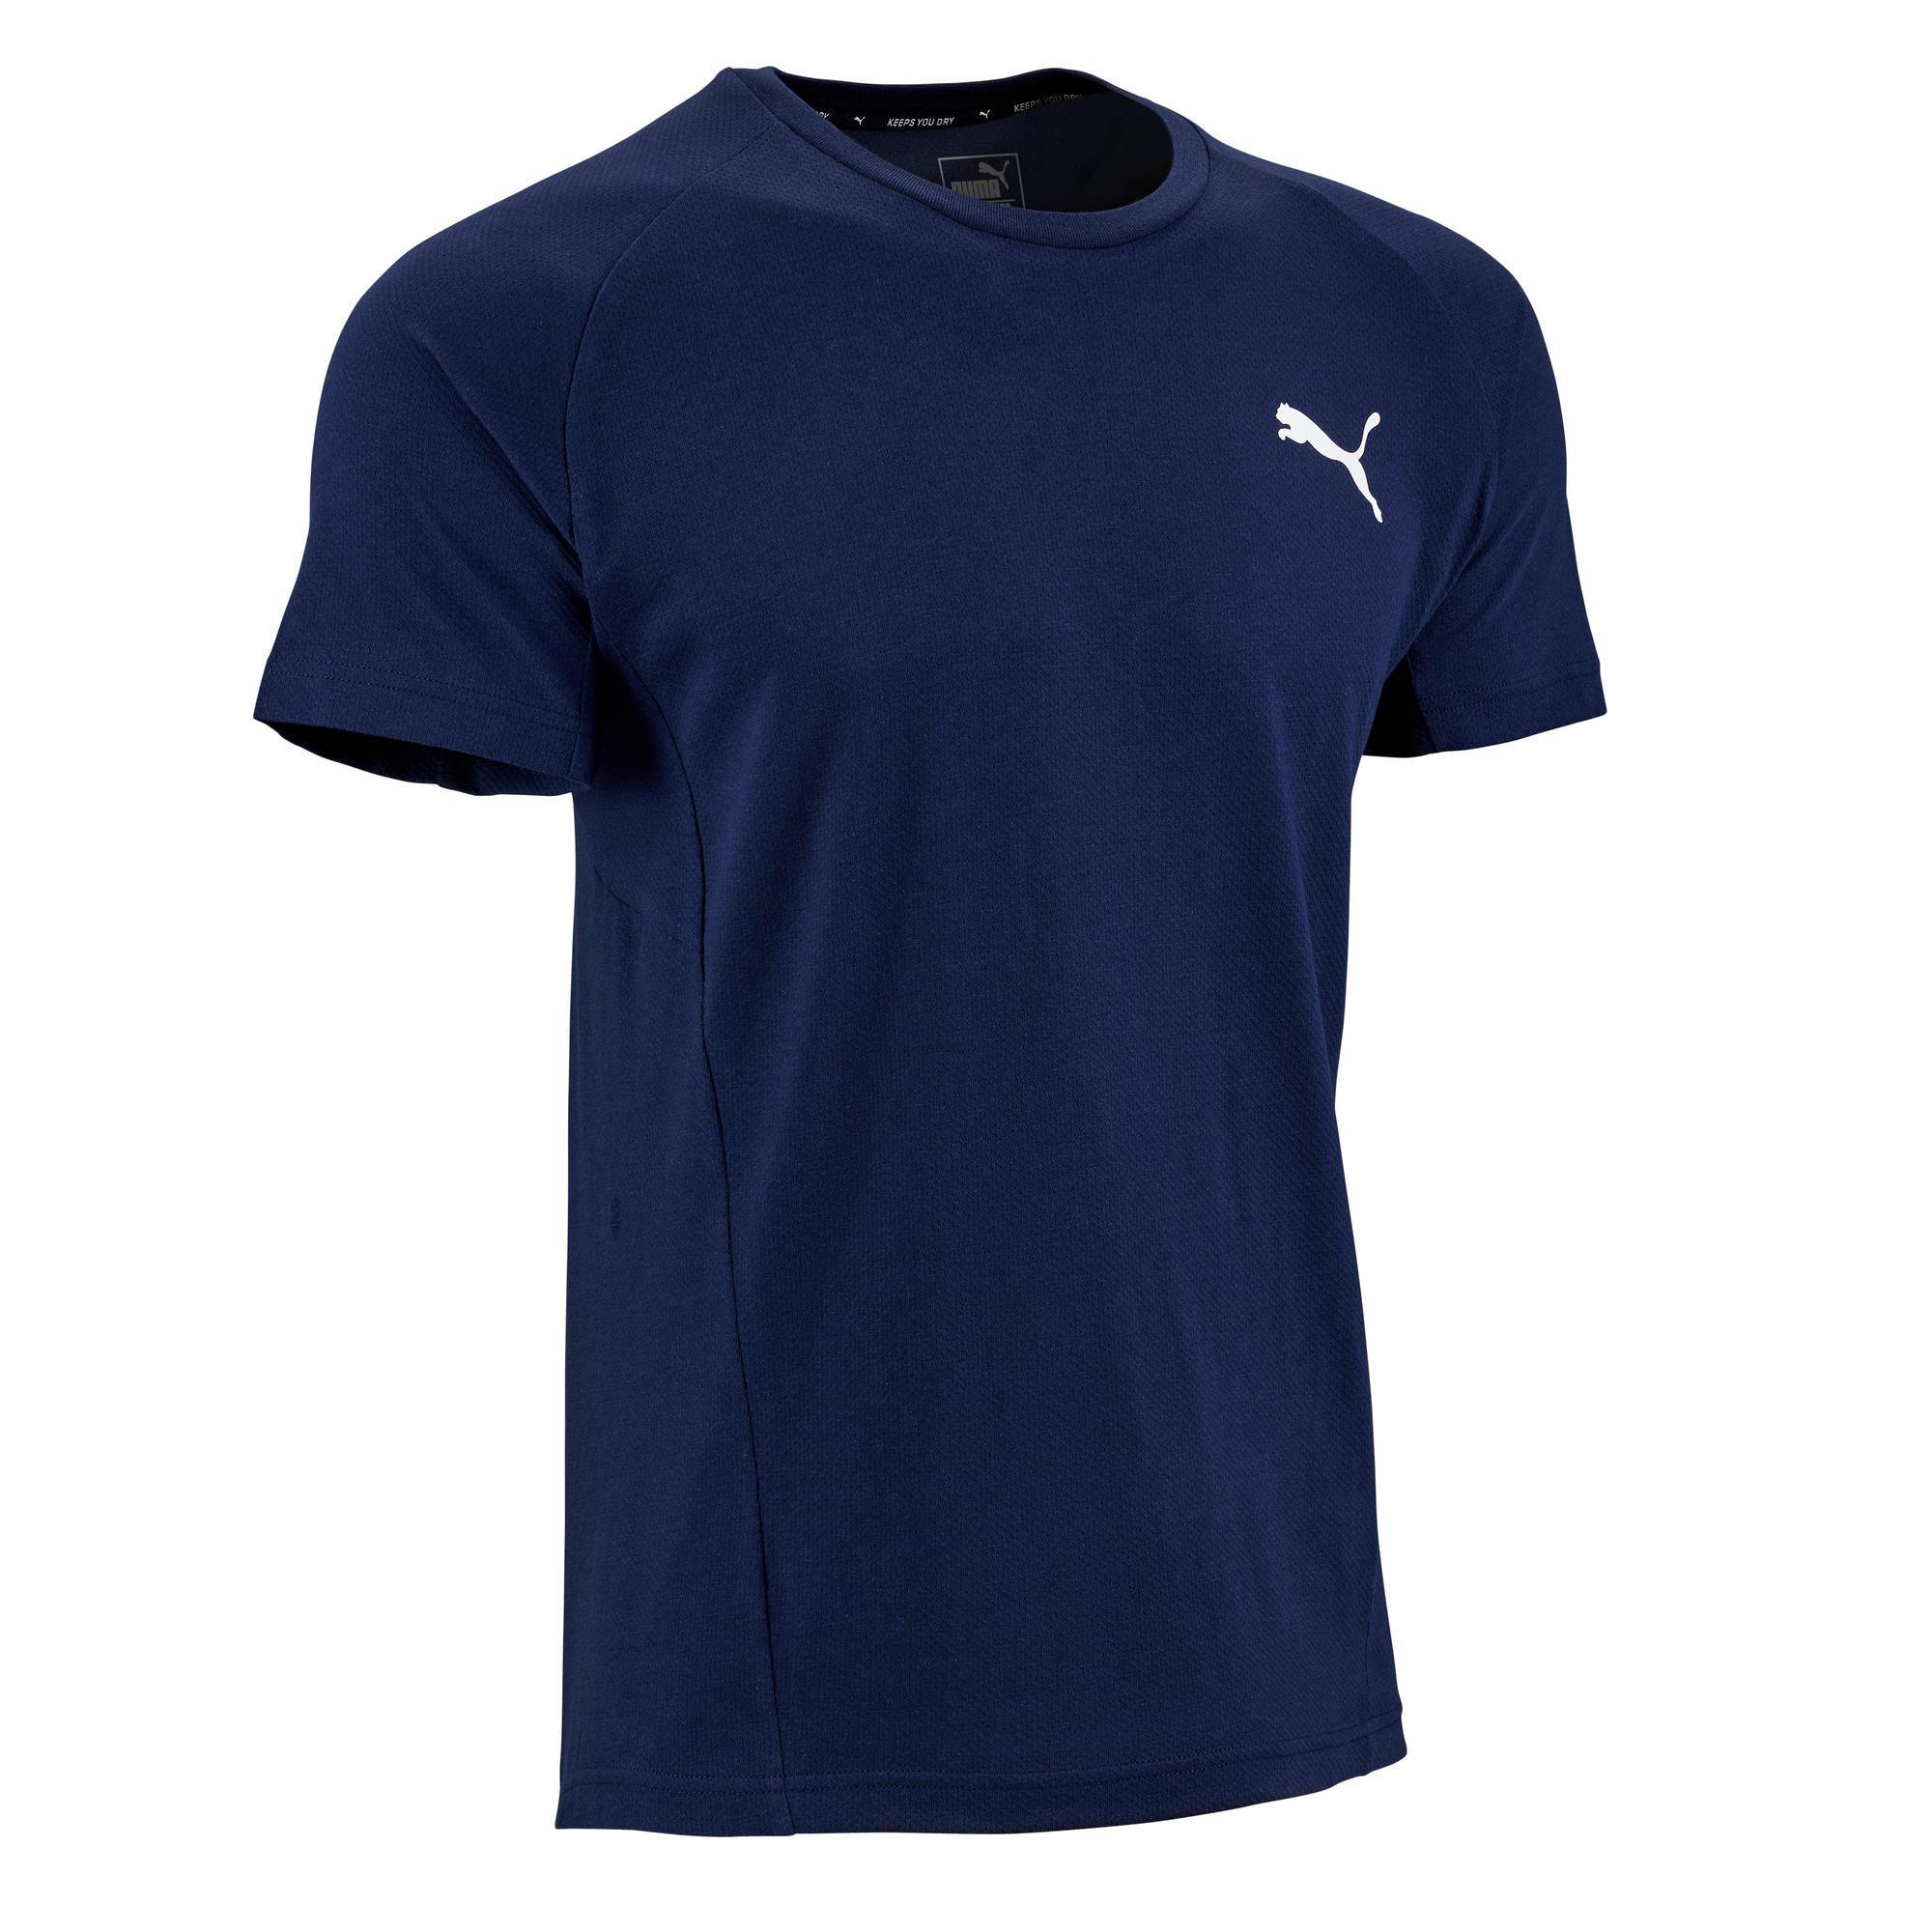 T-Shirt 2.500 Pilates sanfte Gymnastik Herren blau | Sportbekleidung > Sportshirts > Poloshirts | Blau | Puma